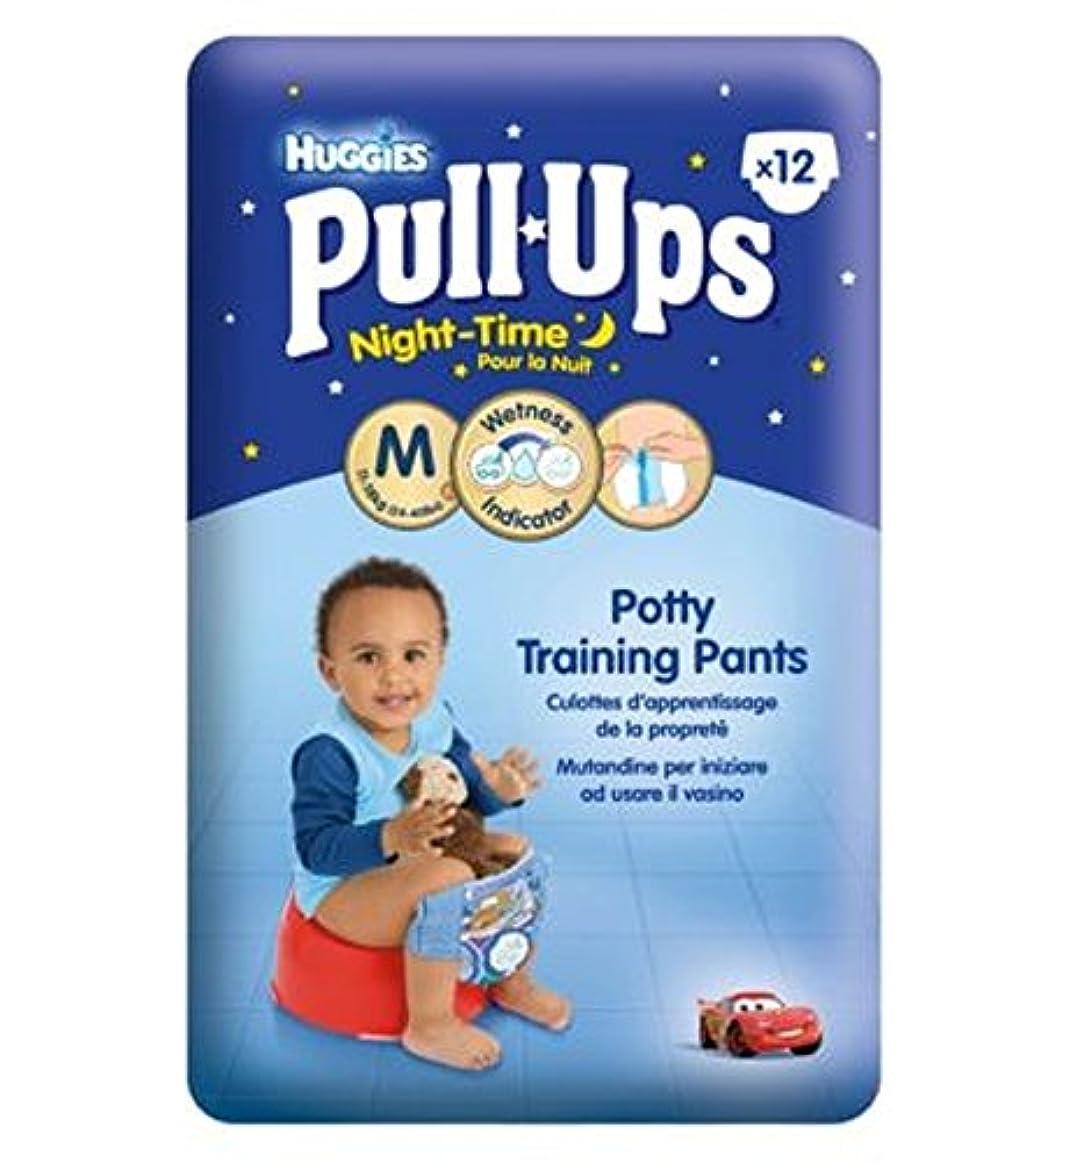 Huggies? Pull-Ups? Disney-Pixar Cars Night-Time Boys Size 5 Potty Training Pants - 1 x 12 Pants - Huggies?プルUps...